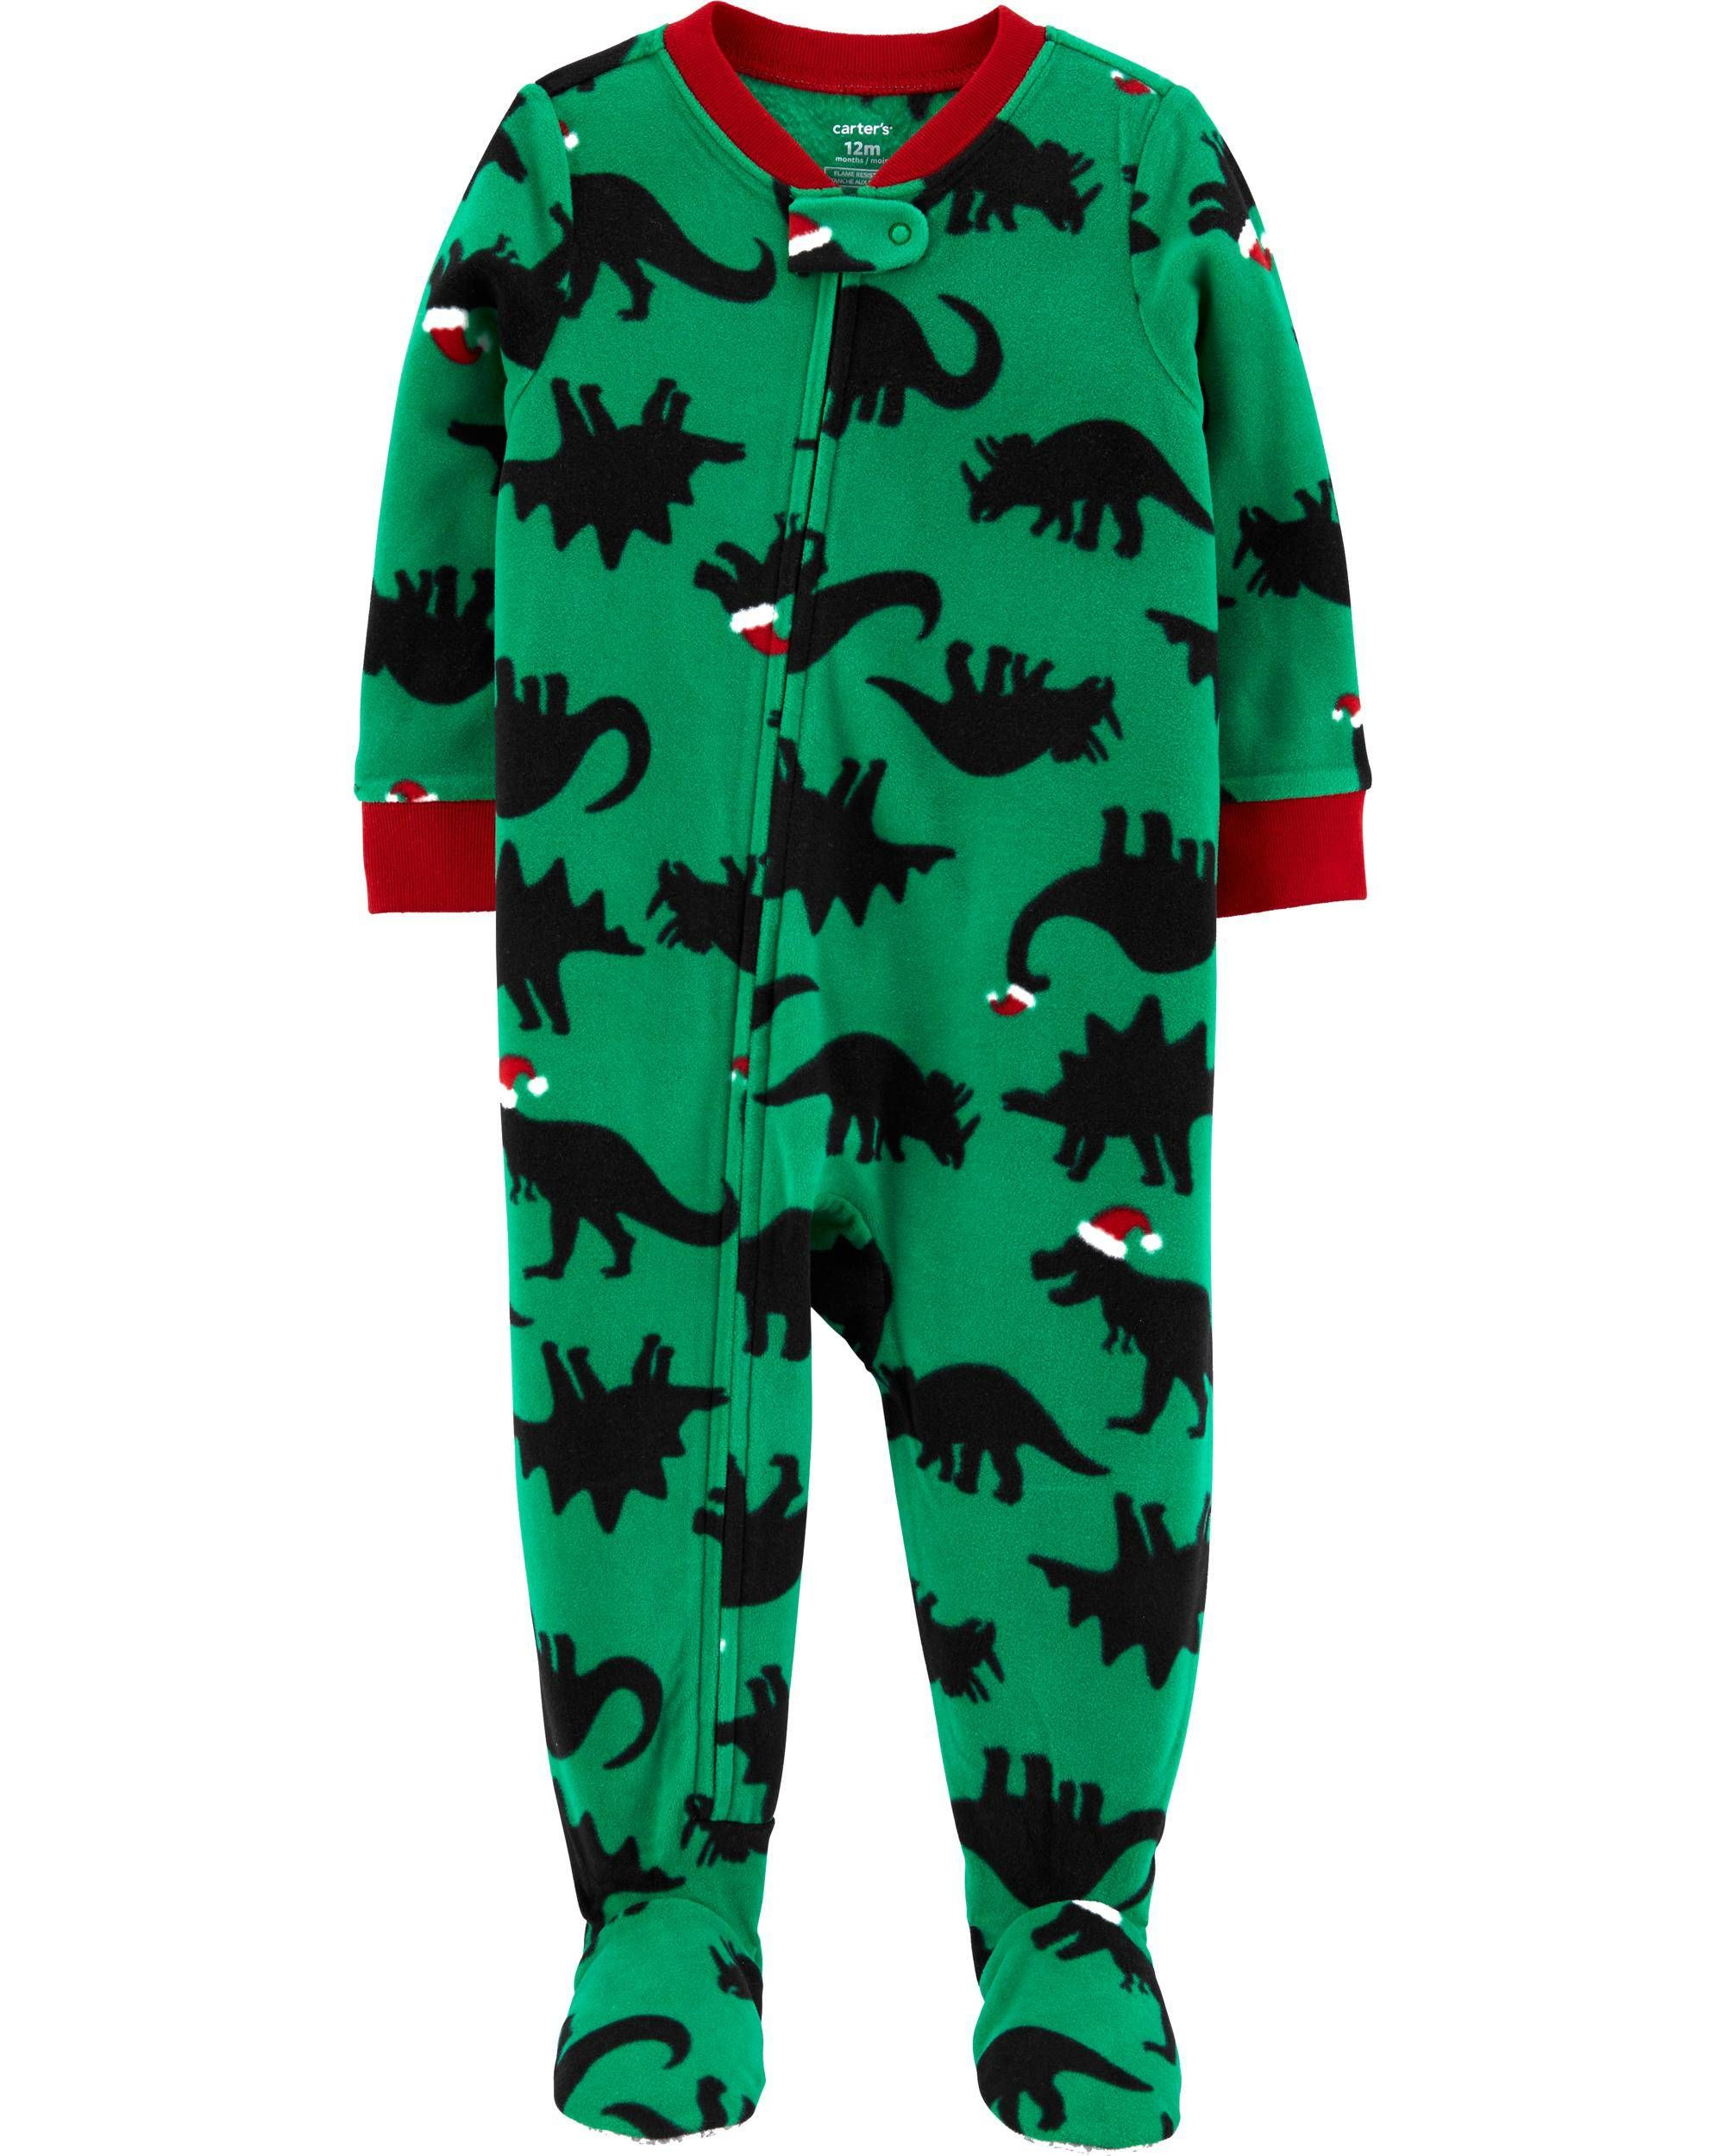 Little Boys Infant Toddler Green Camo Fleece Footed Pajamas Sleeper